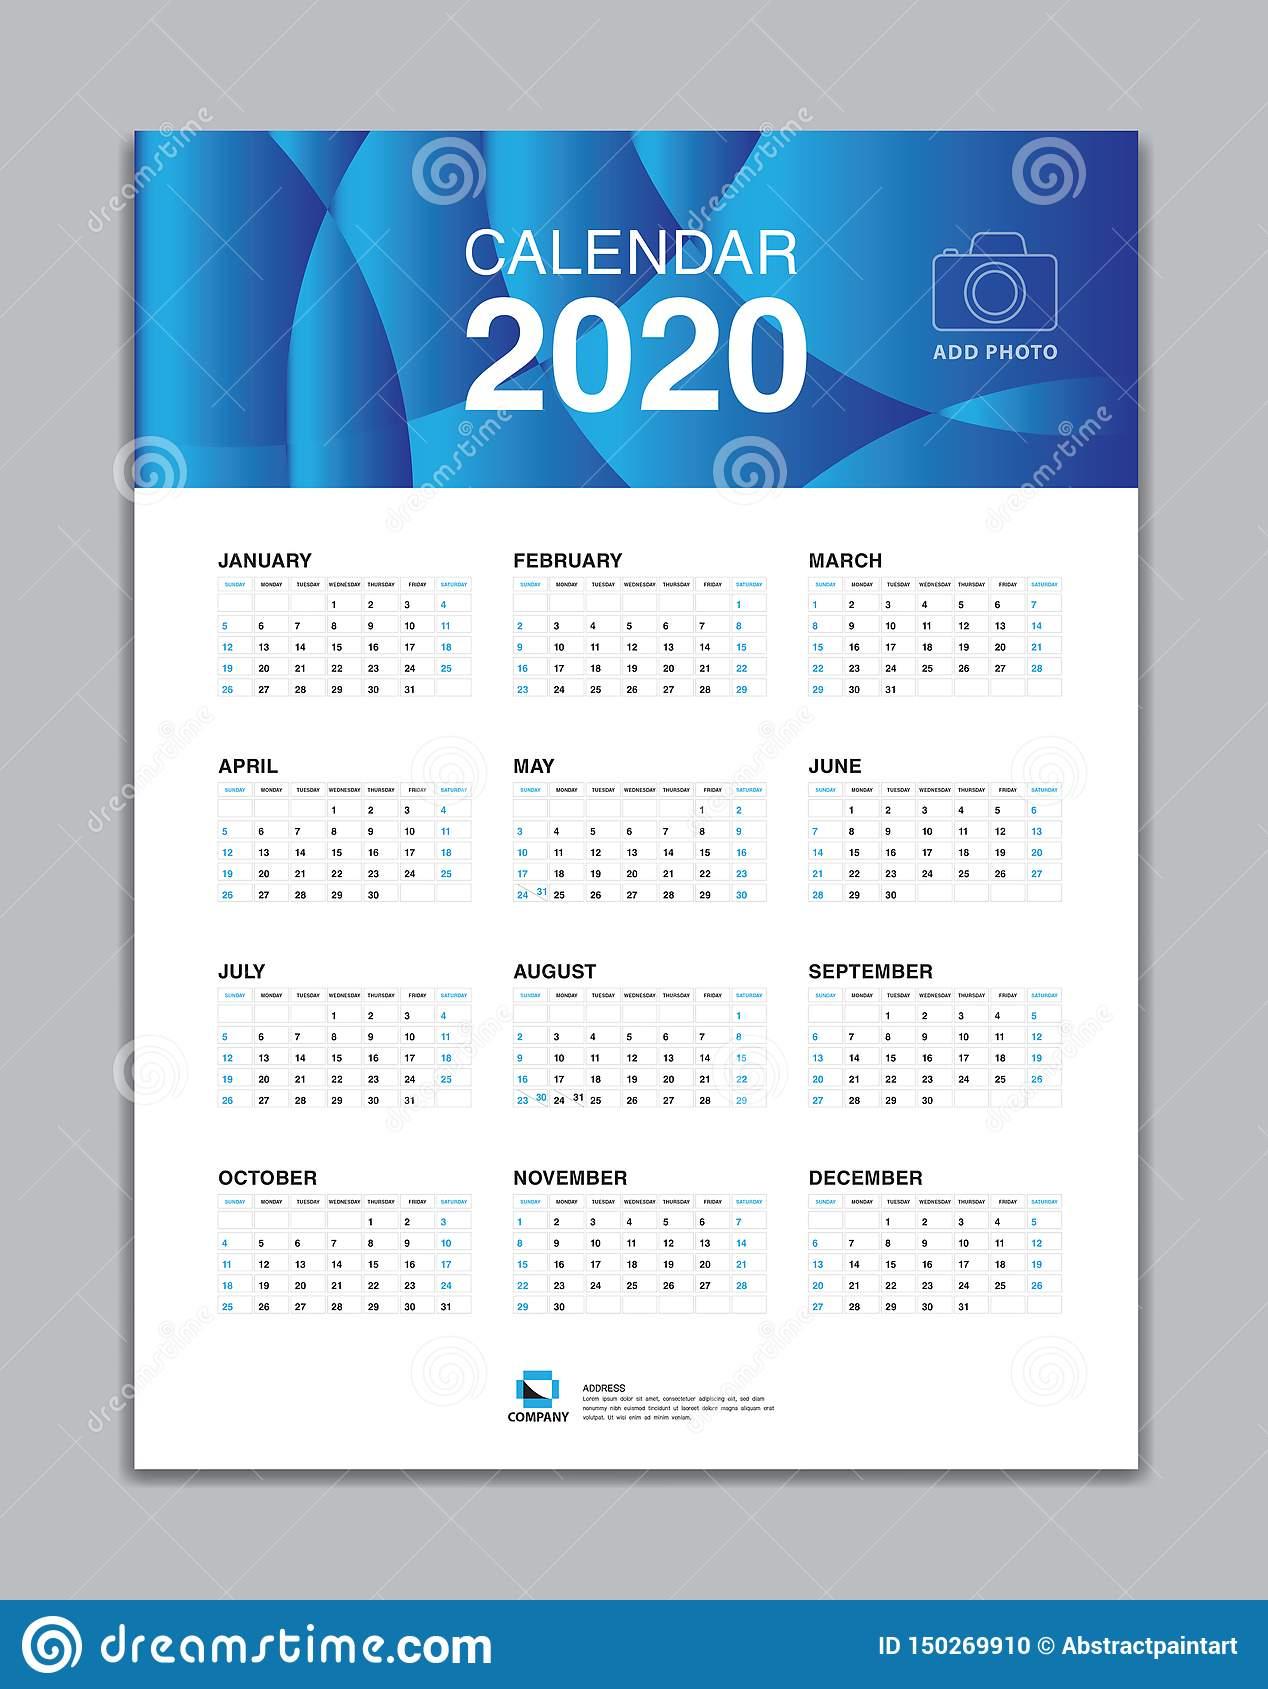 Calendar 2020 Template, Wall Calendar 2020 Vector, Desk